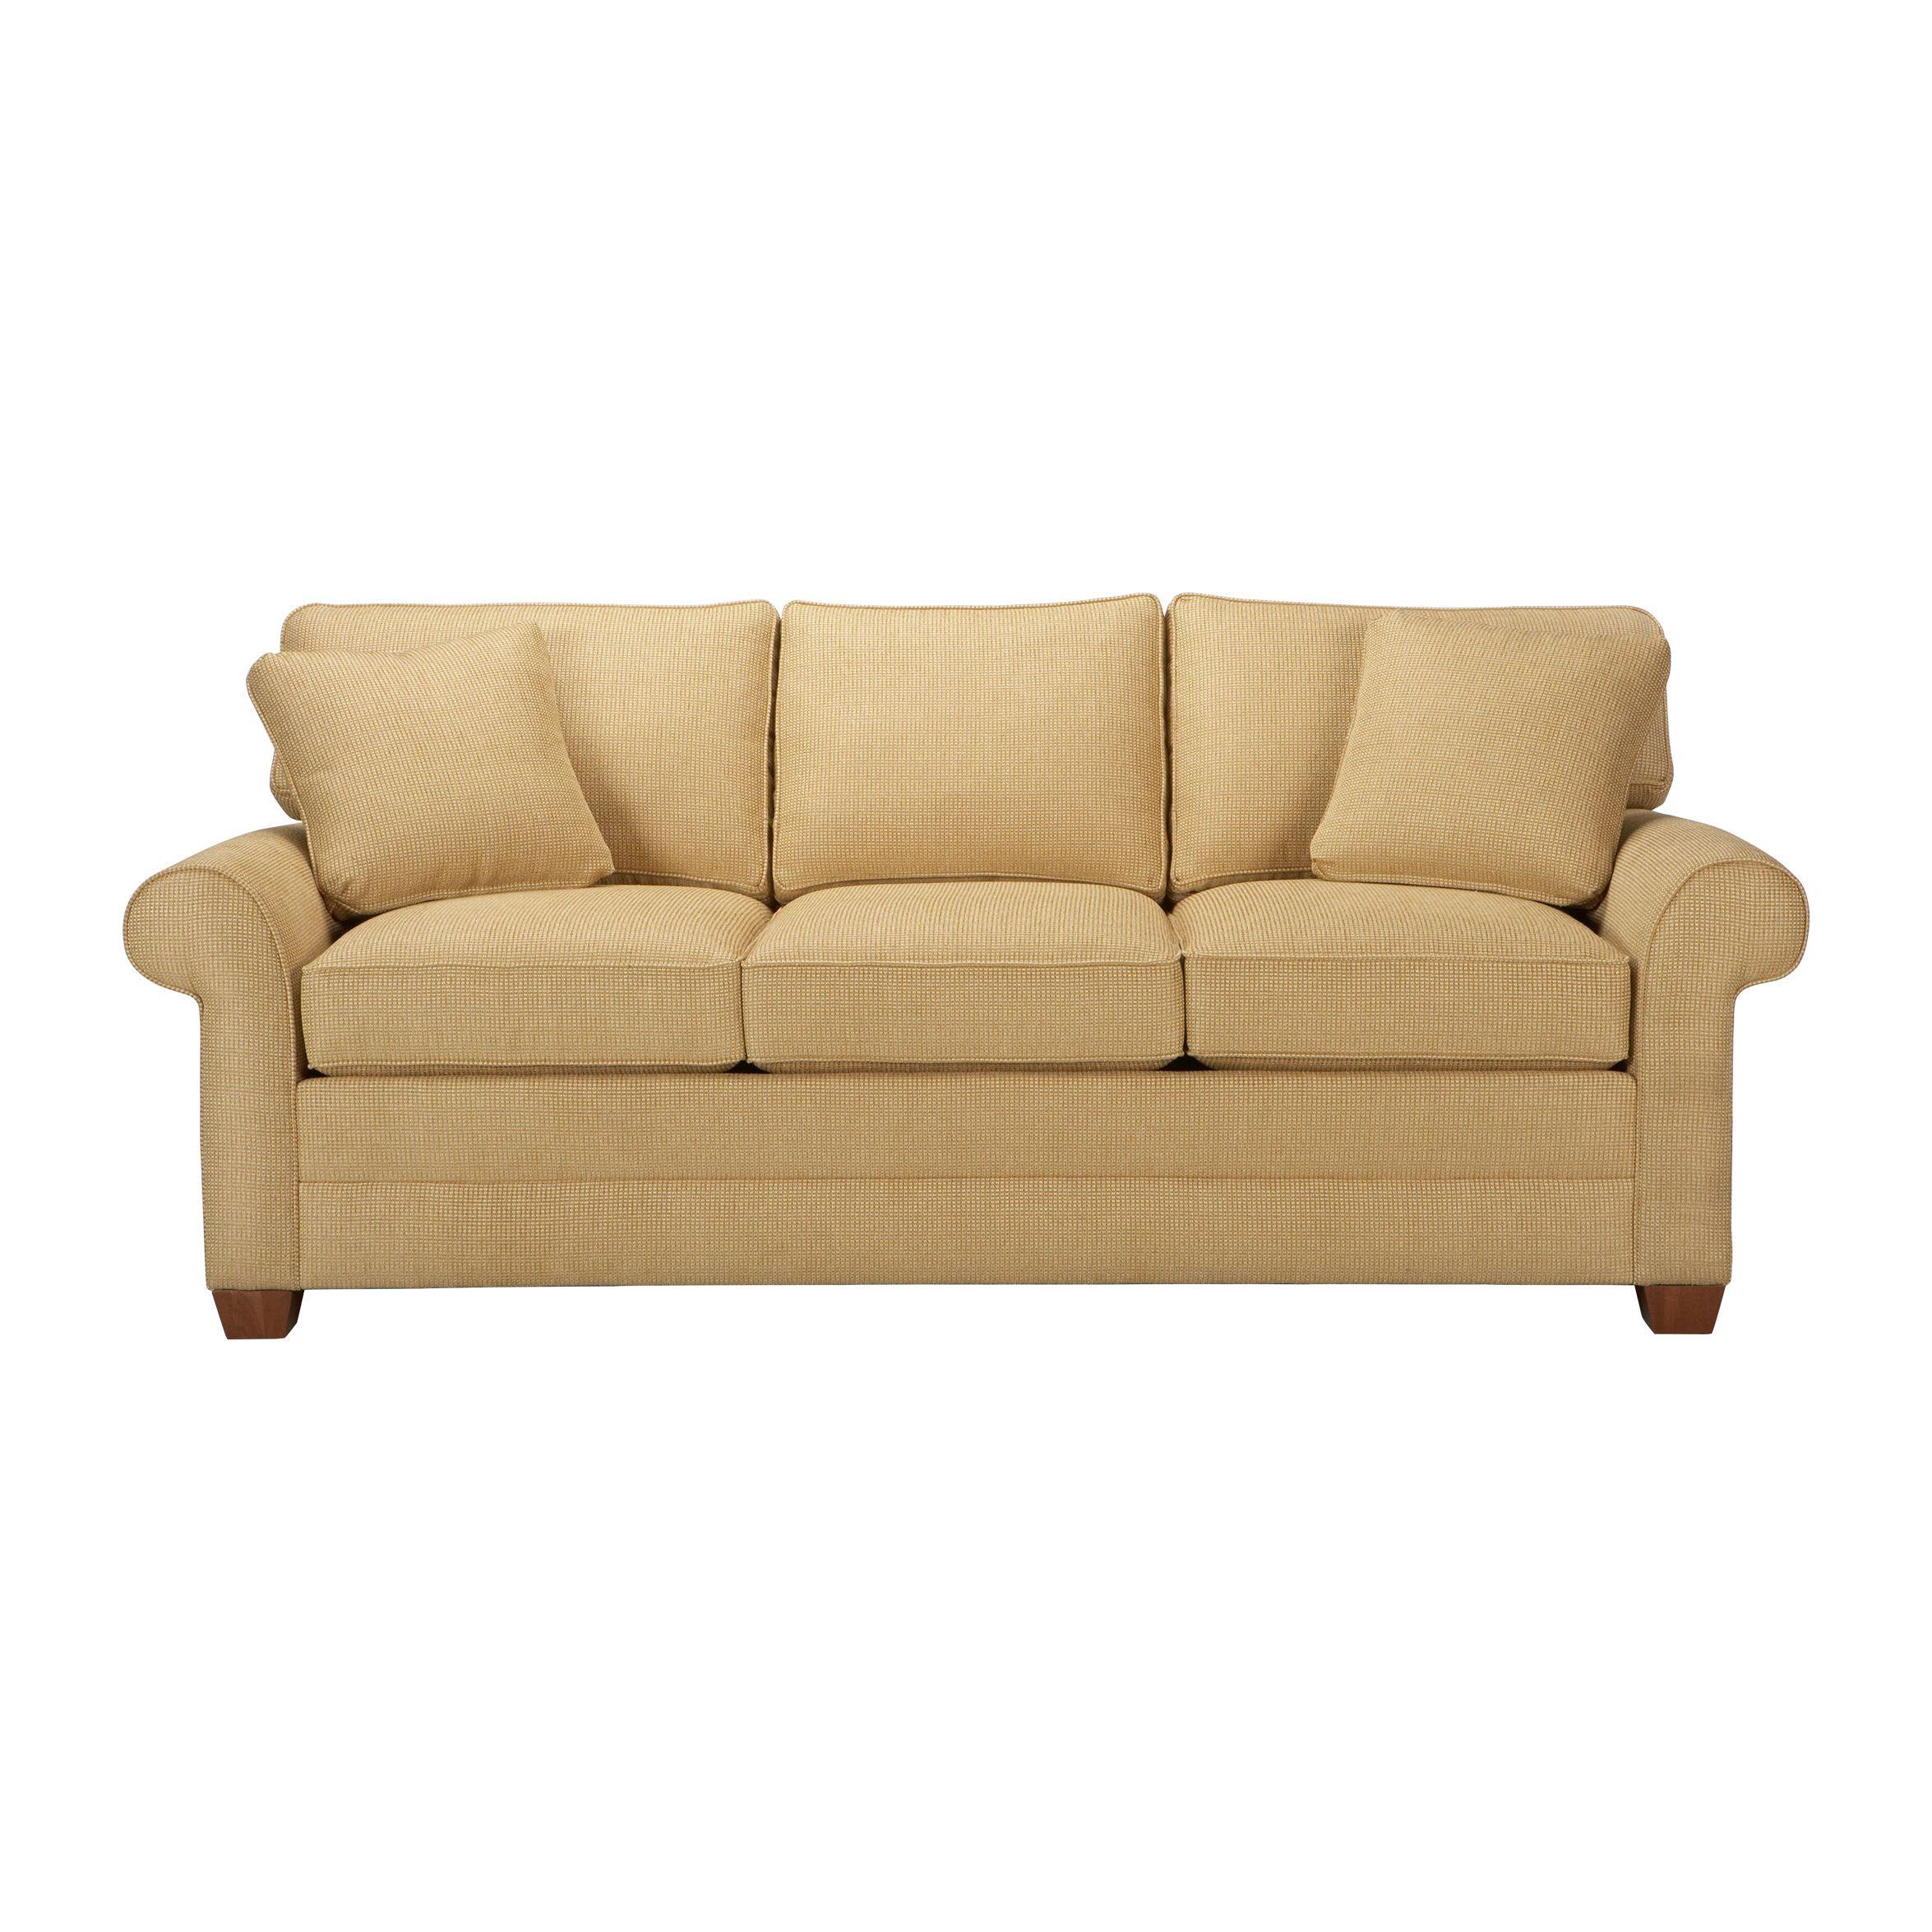 Bennett Three Cushion Roll Arm Sofas Ethan Allen Us